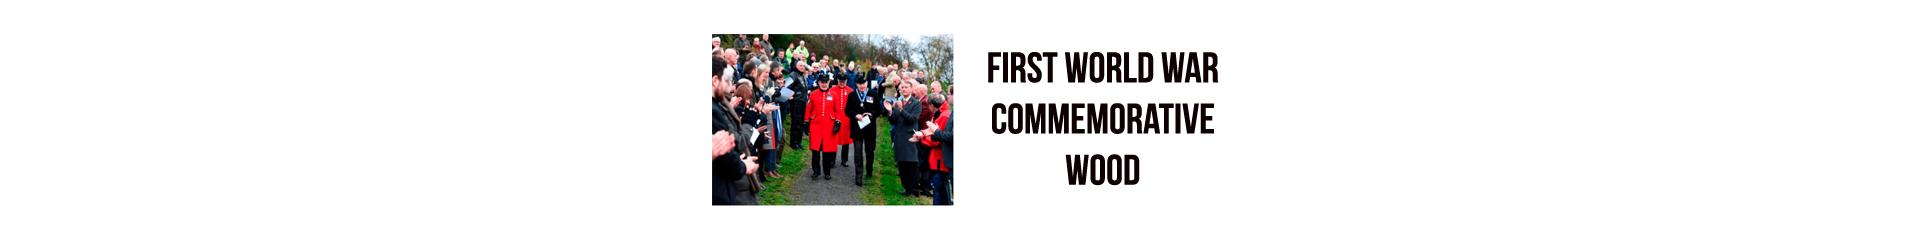 First World War Commemorative Wood – Brackfield Wood – Northern Ireland